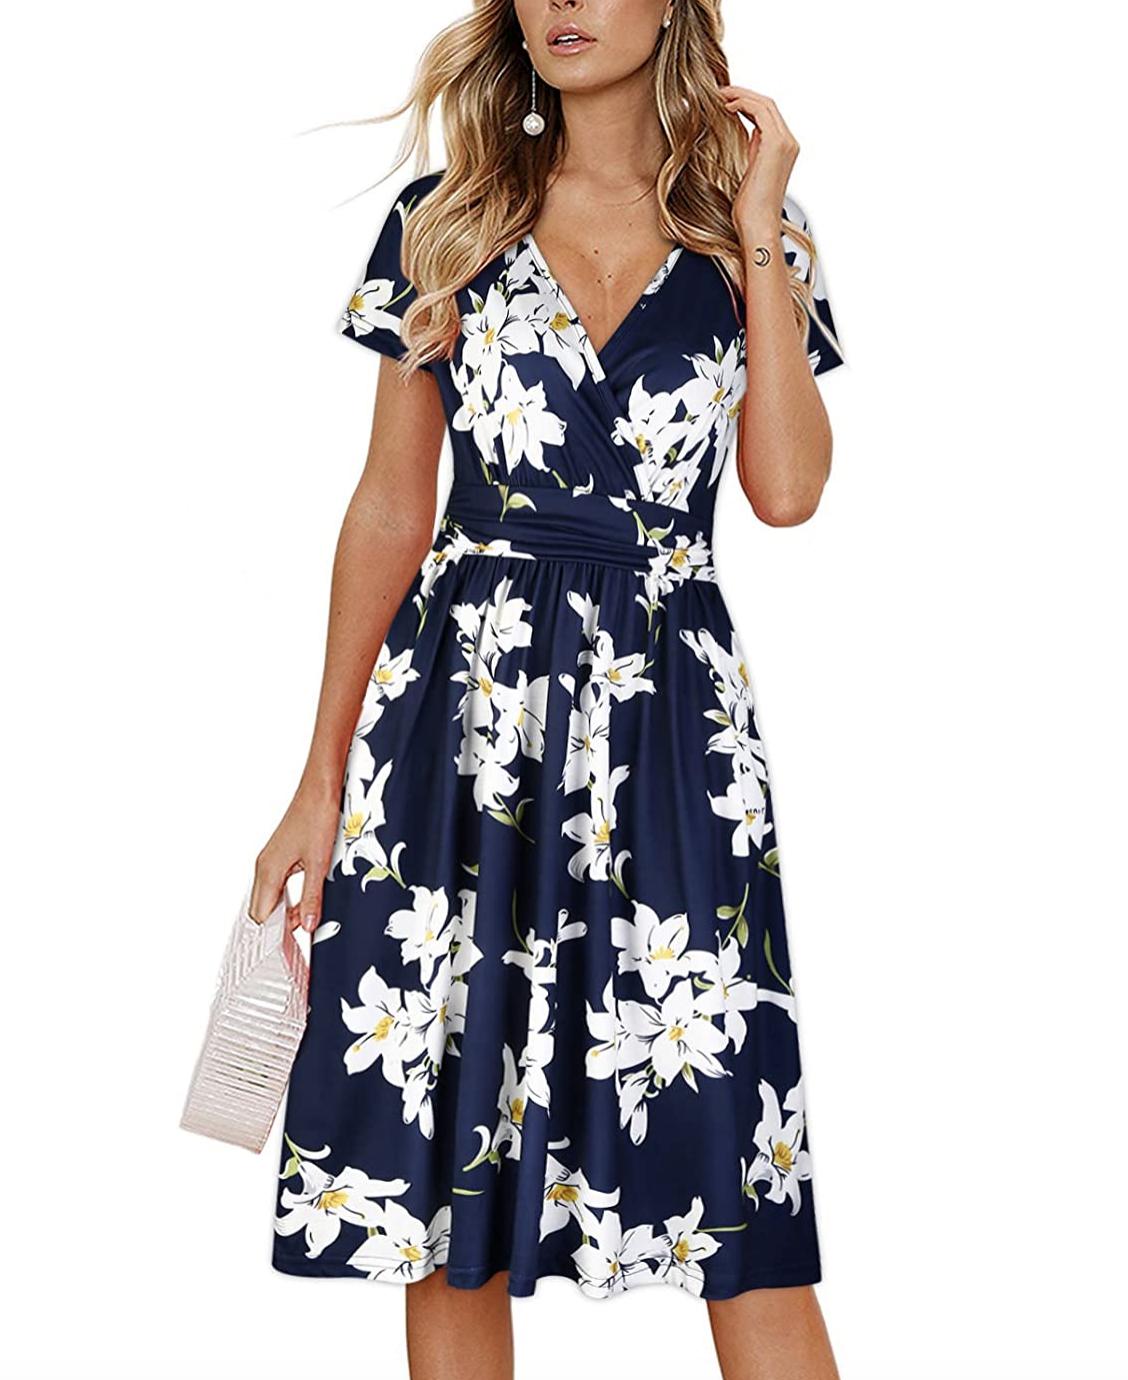 Summer Days Floral Midi Dress In 2021 Summer Dresses Dresses Summer Dresses For Women [ 1380 x 1128 Pixel ]